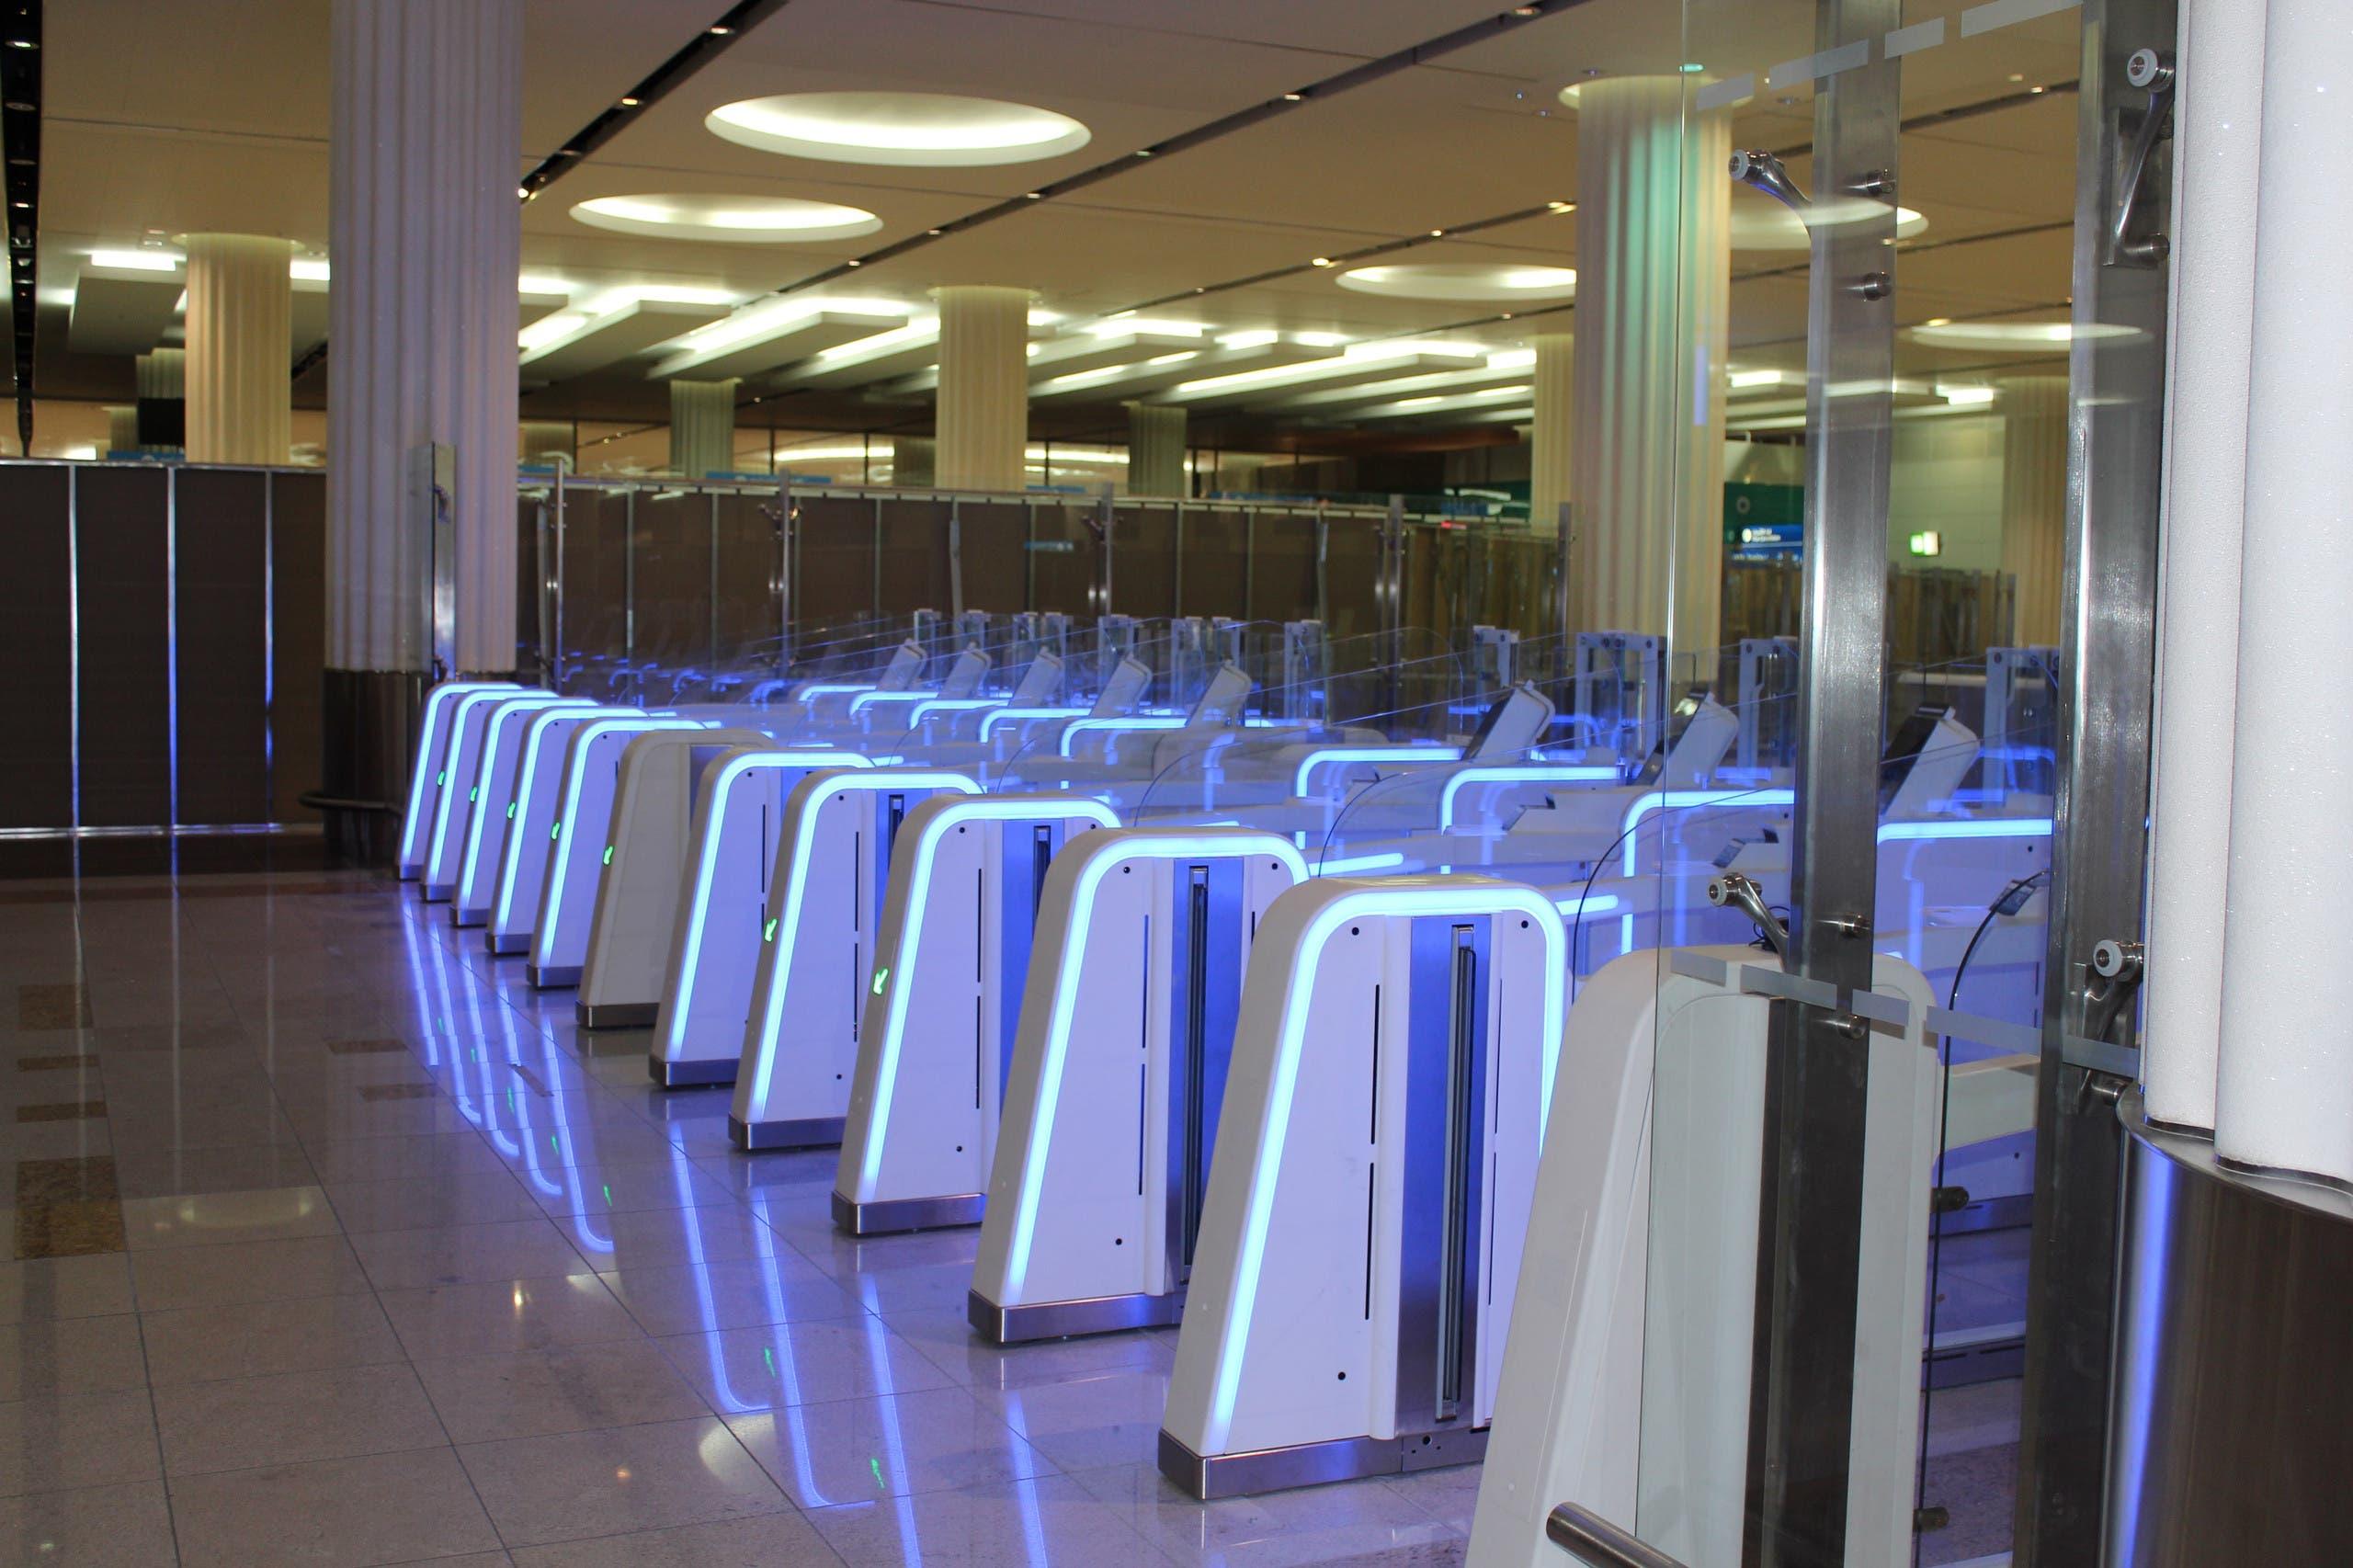 smart gates Dubai 3 (Supplied)